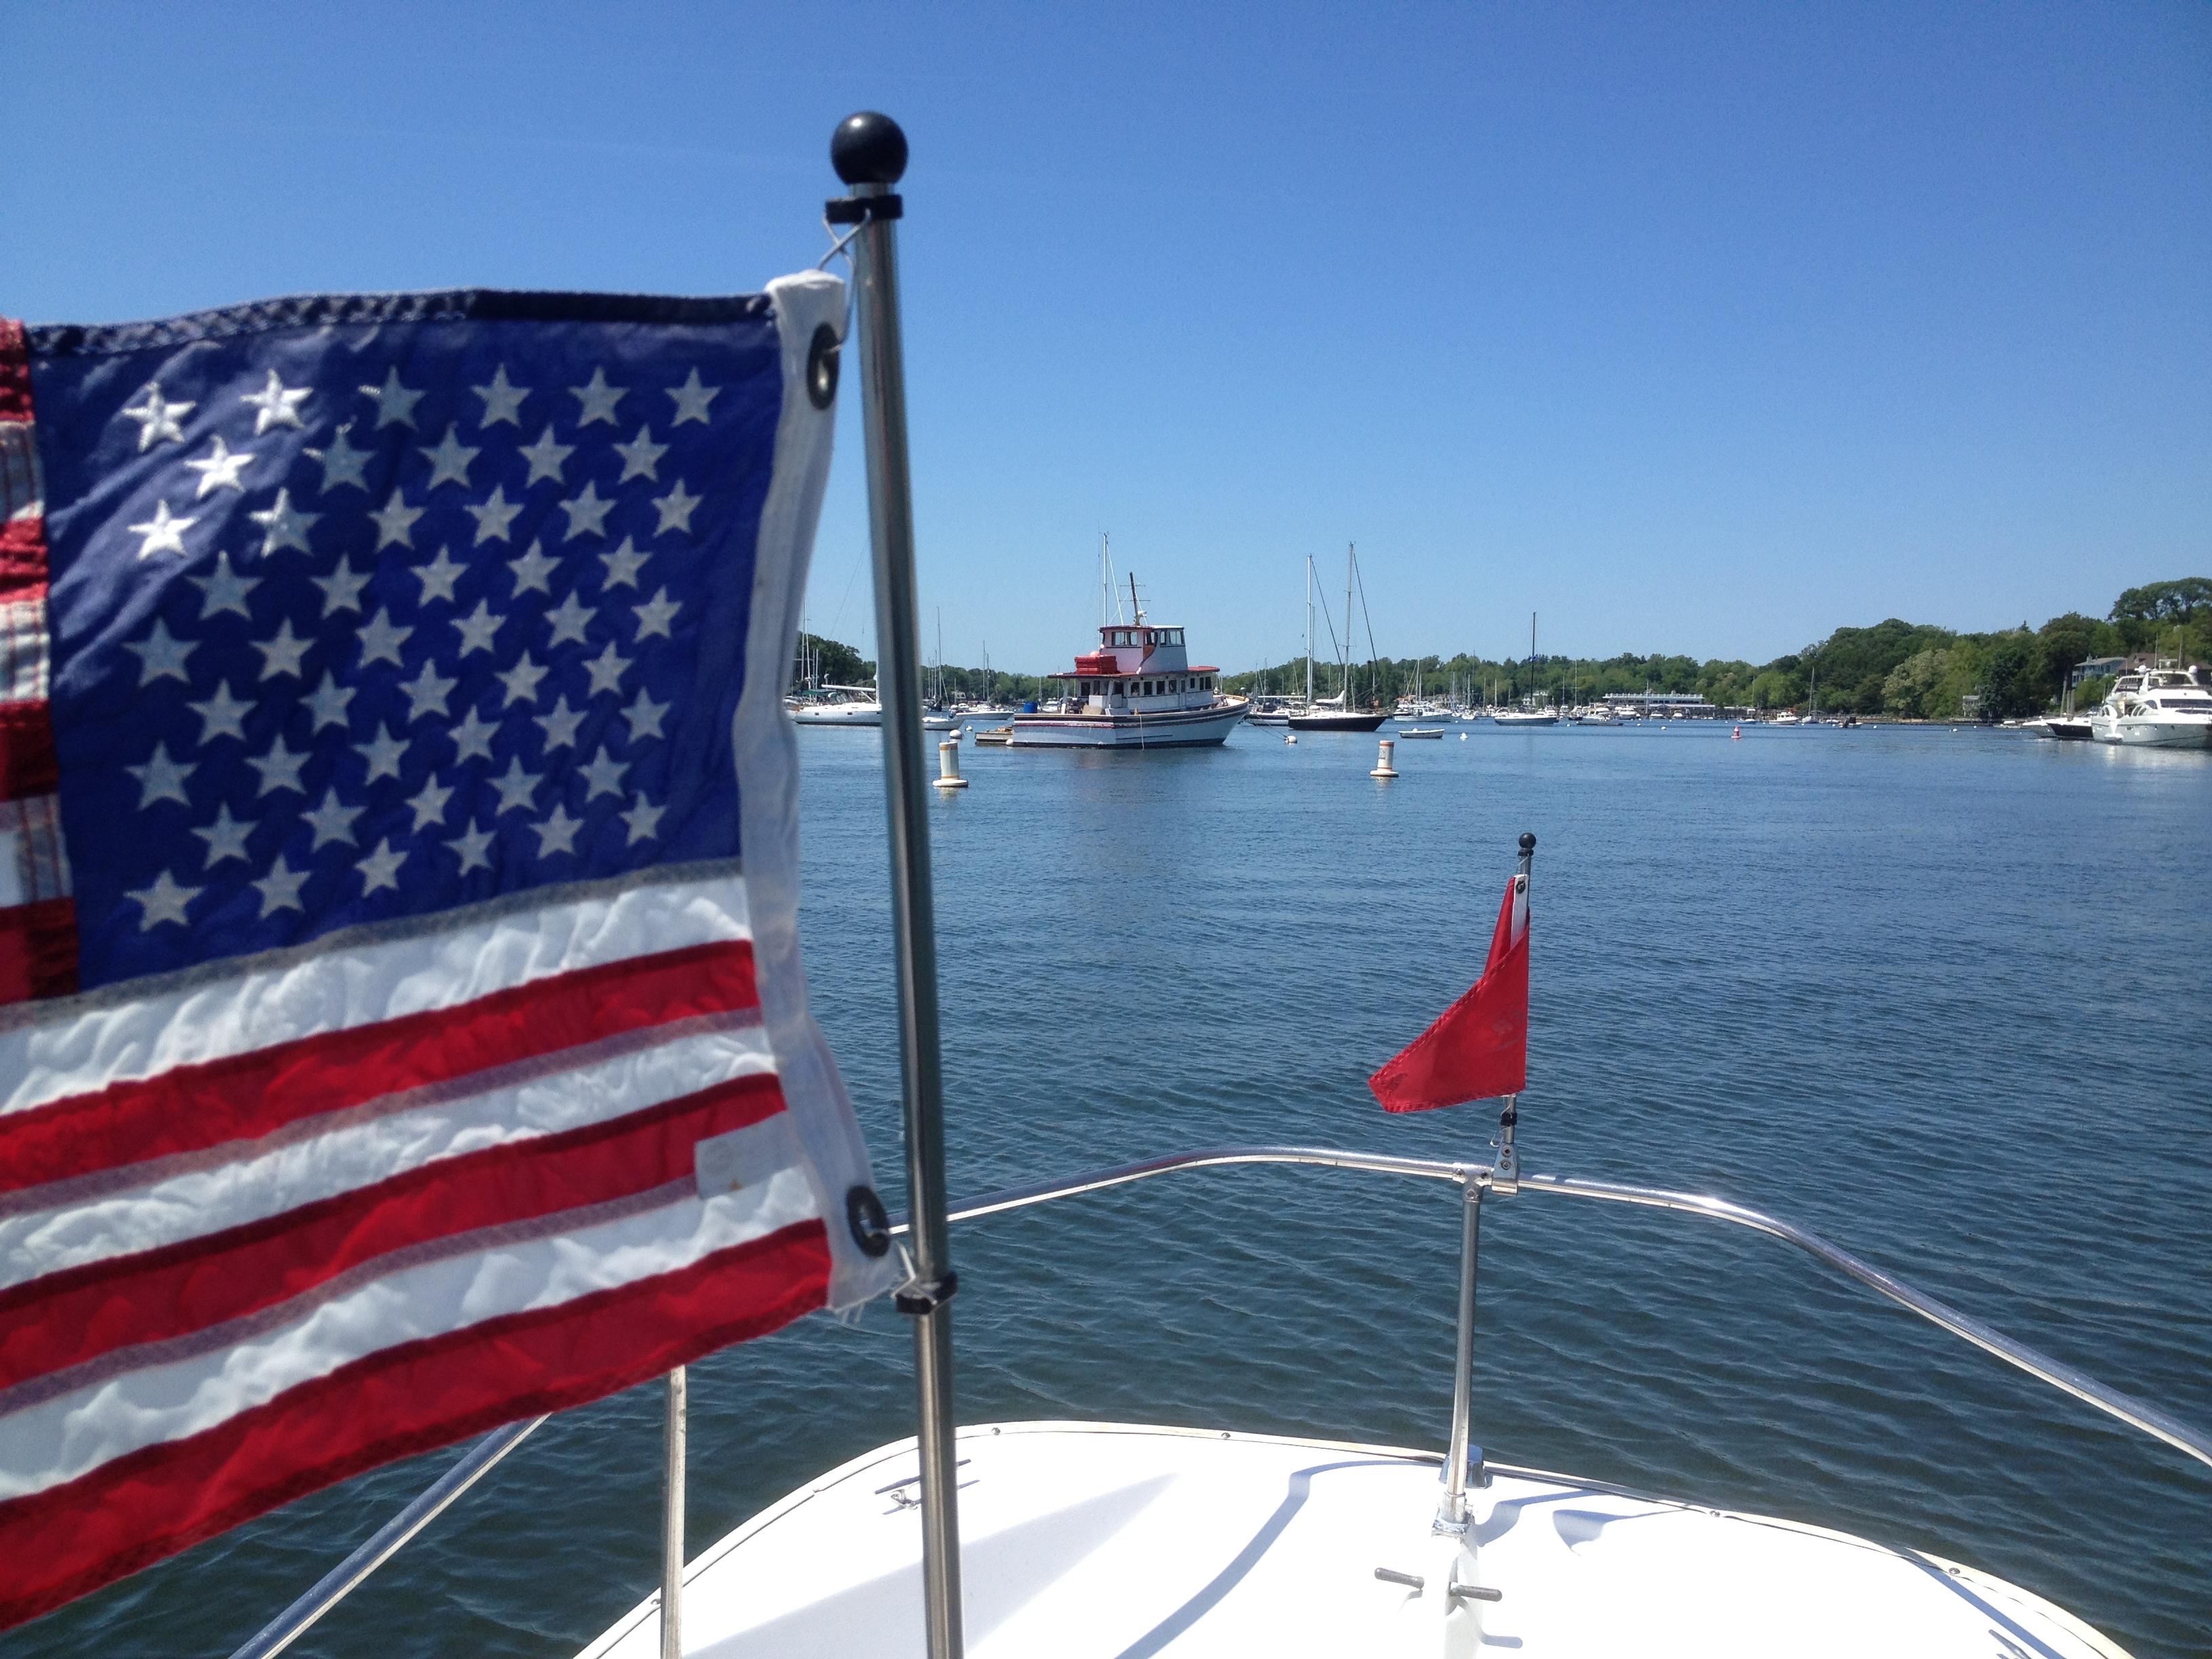 2012-05-19 Huntington Harbor Cruise 06.jpg